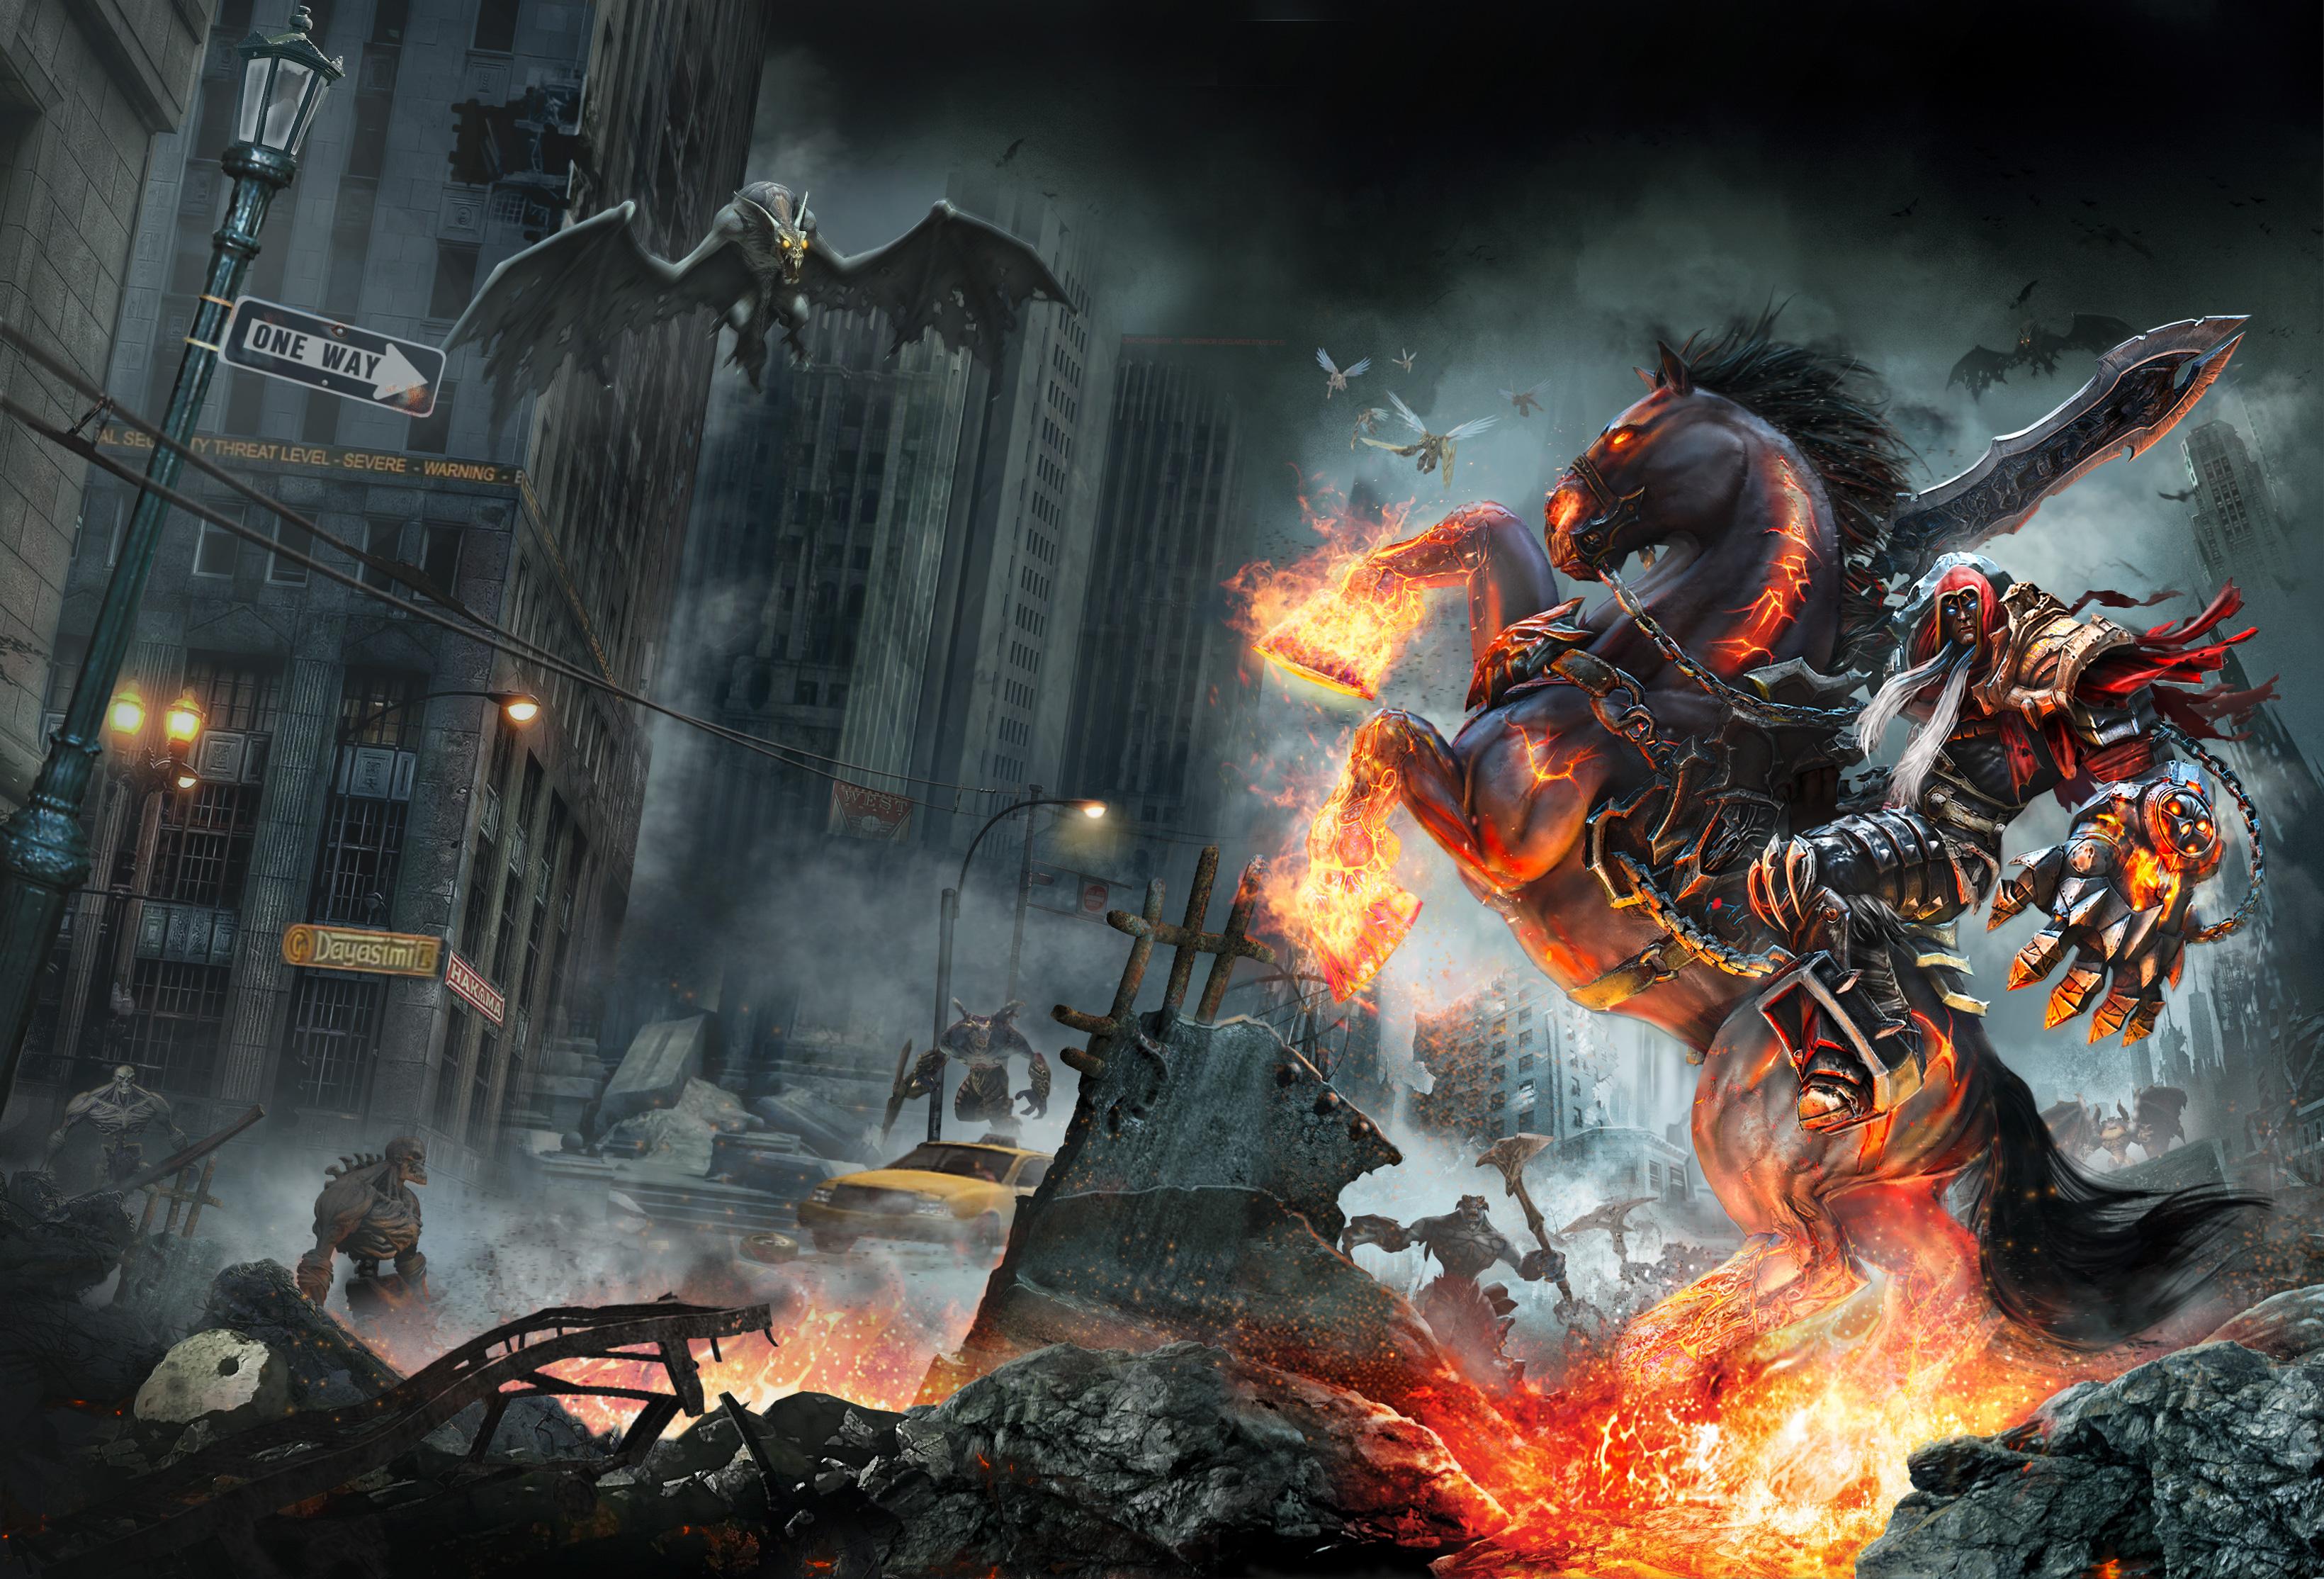 2560x1080 Playerunknowns Battlegrounds 2017 Game 2560x1080: Darksiders Game Warmastered Edition 2017, HD Games, 4k